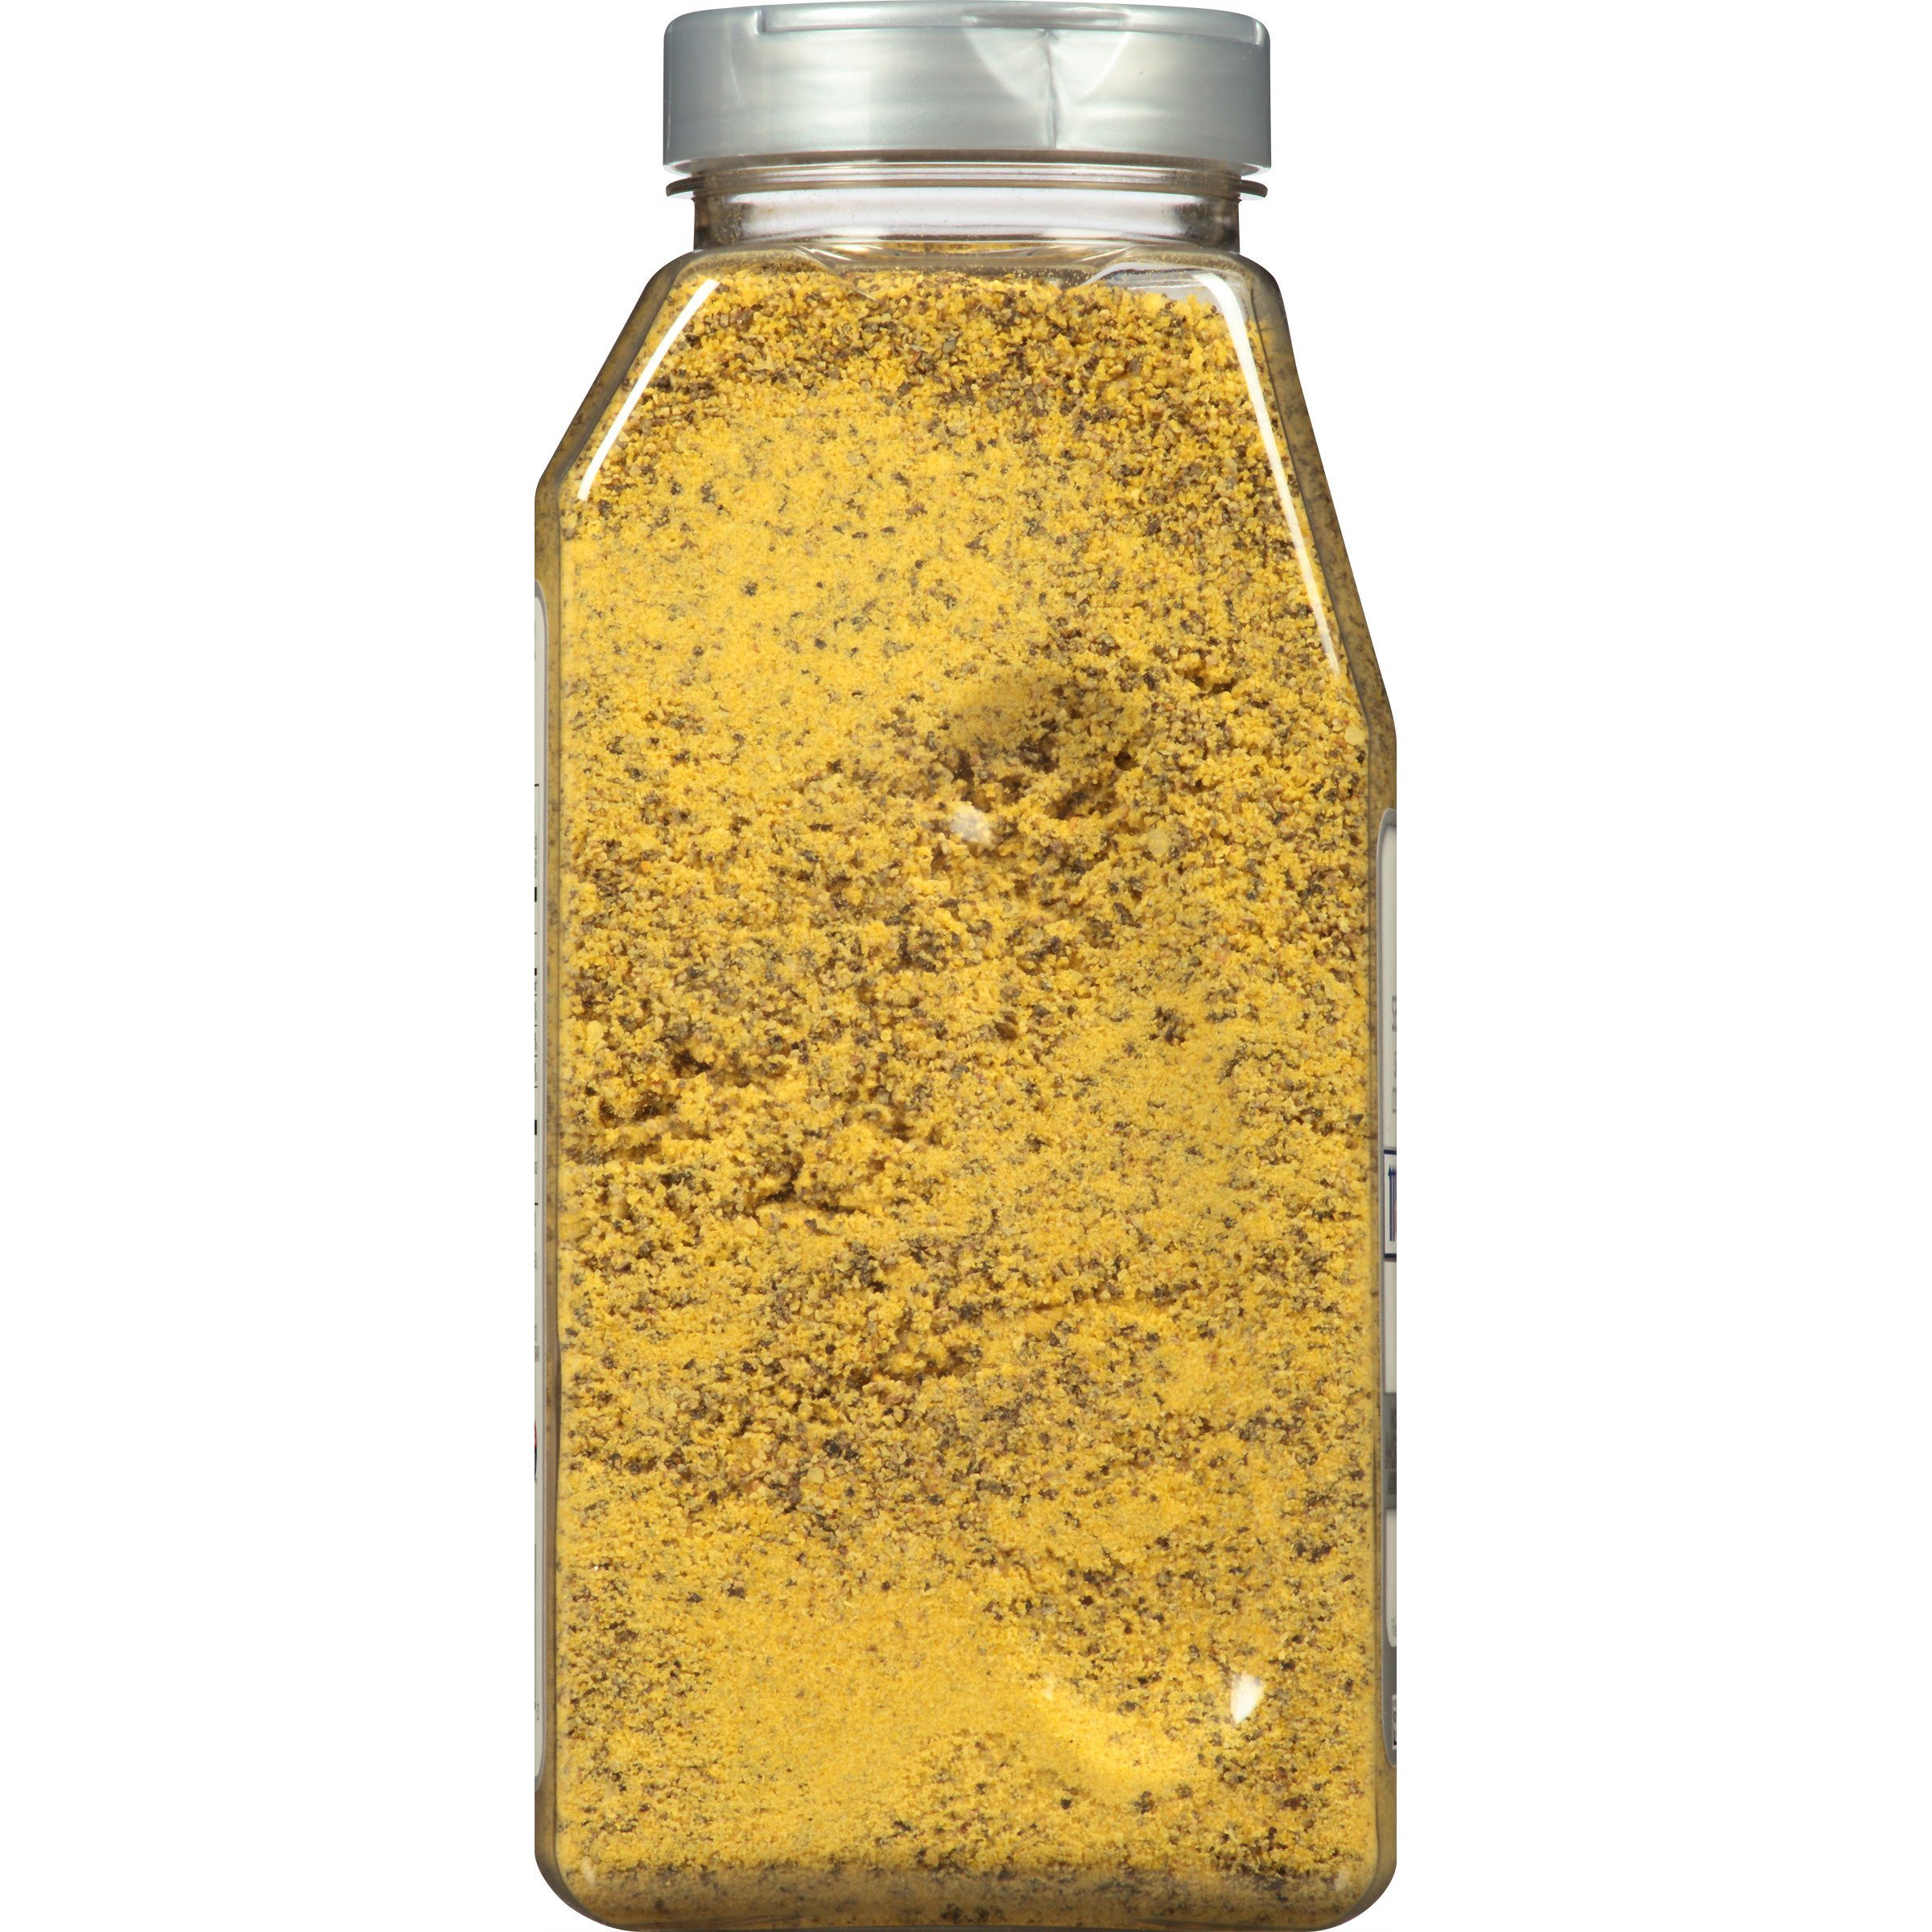 McCormick Culinary Lemon & Pepper Seasoning Salt, 28 oz by McCormick (Image #4)